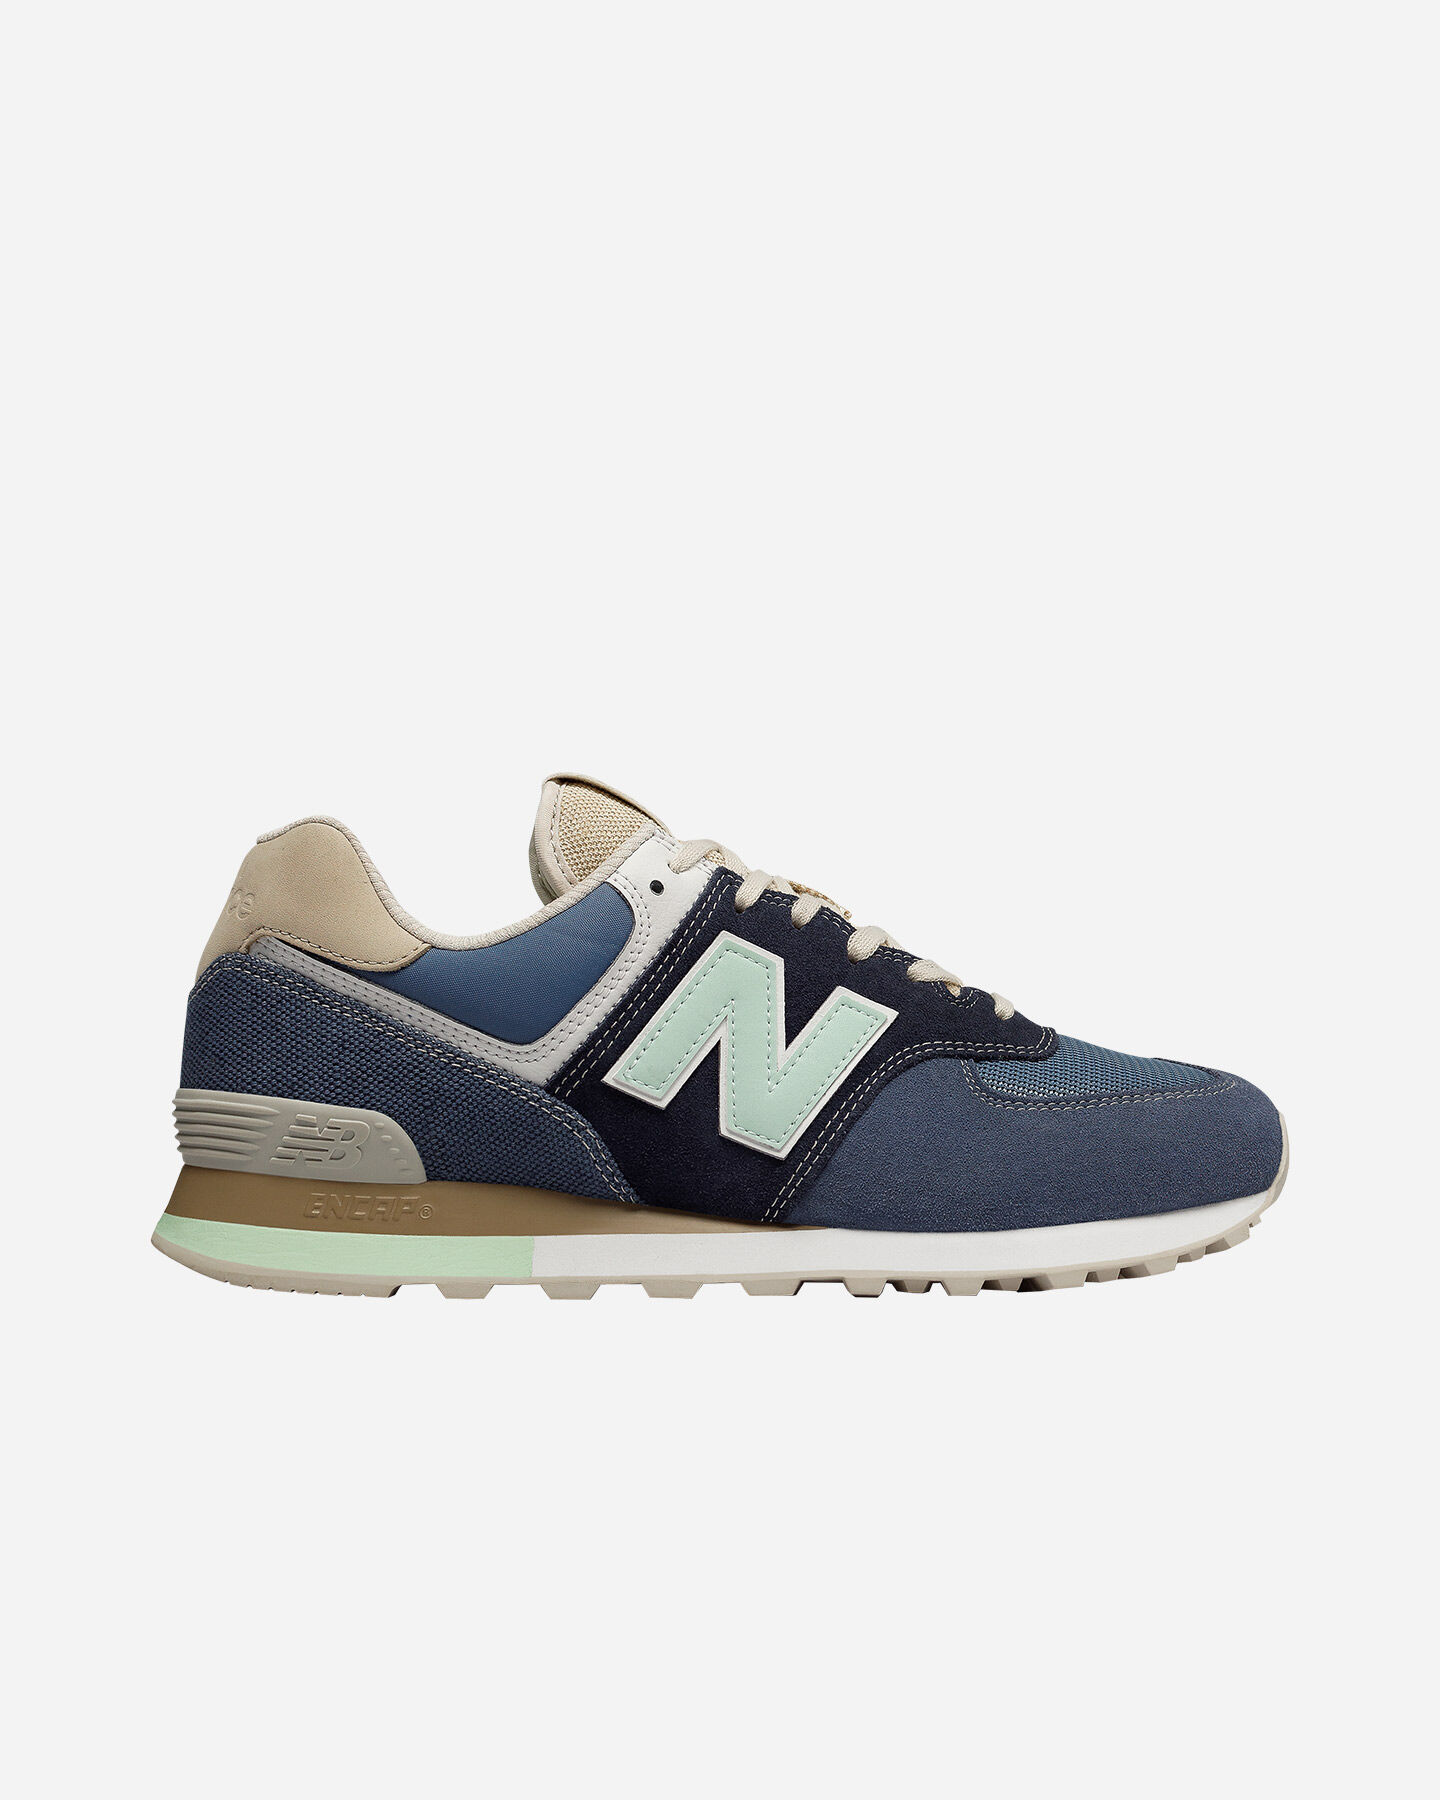 scarpe simili alle new balance